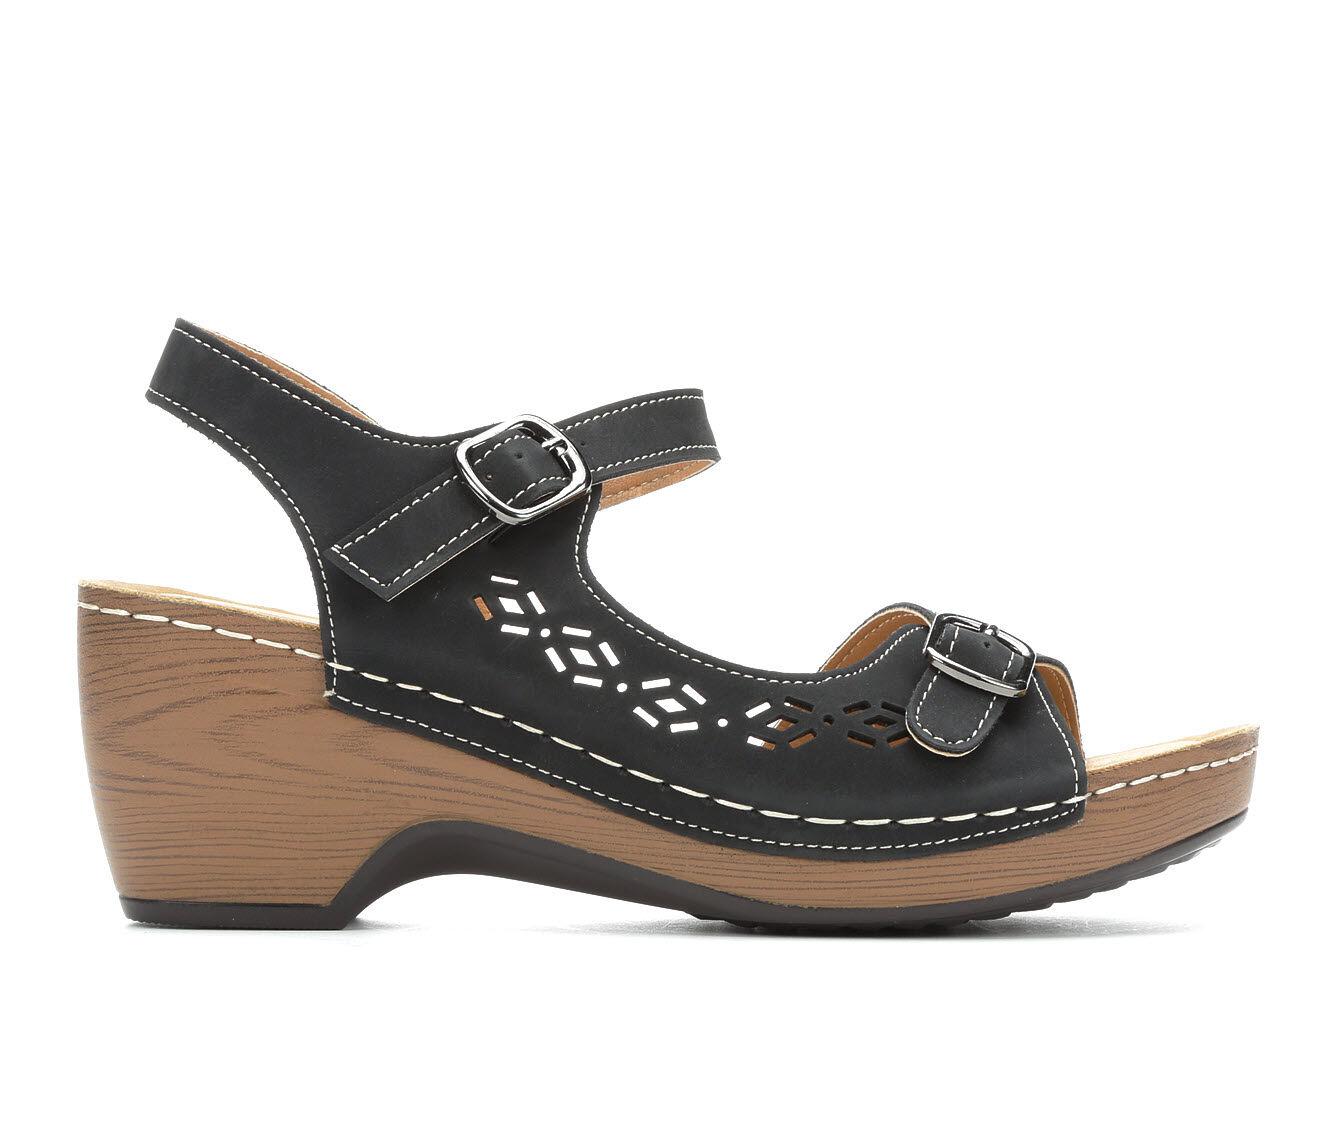 purchase comfortable Women's Patrizia Shantay Heeled Sandals Black